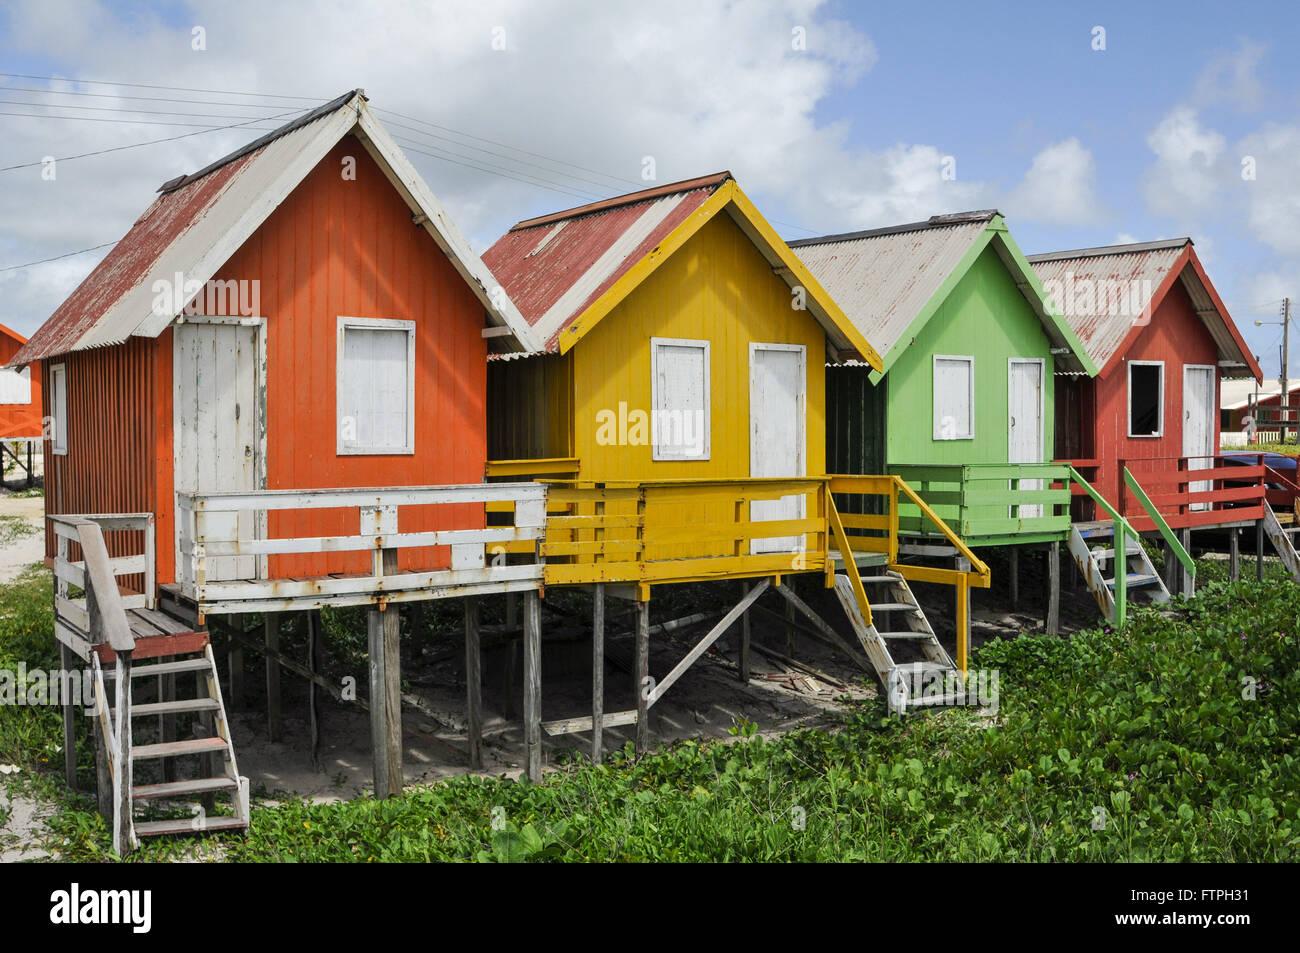 Wooden houses in Ponta da Barca - village of Ajuruteua - Stock Image